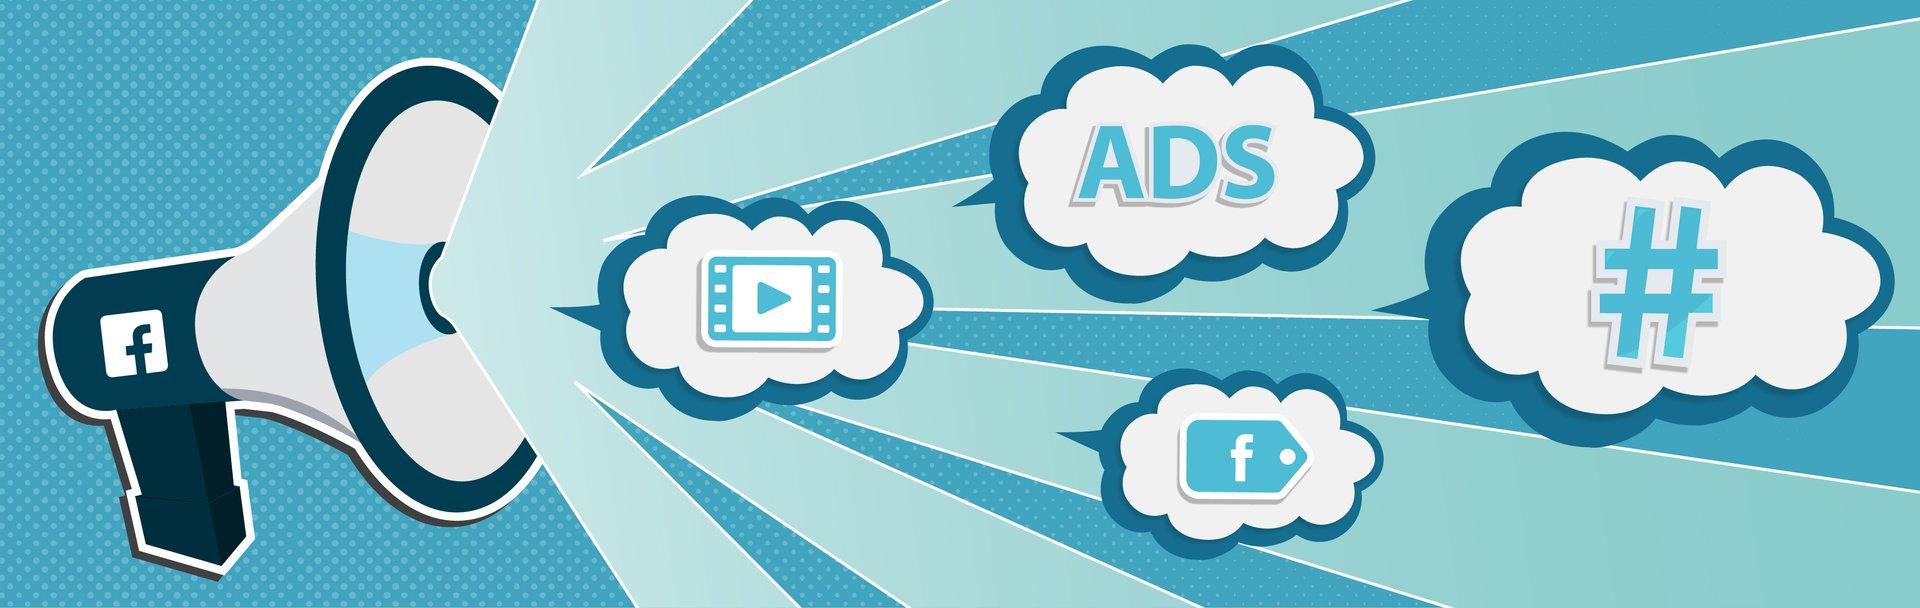 Blog_Facebook Graphic_Event marketing